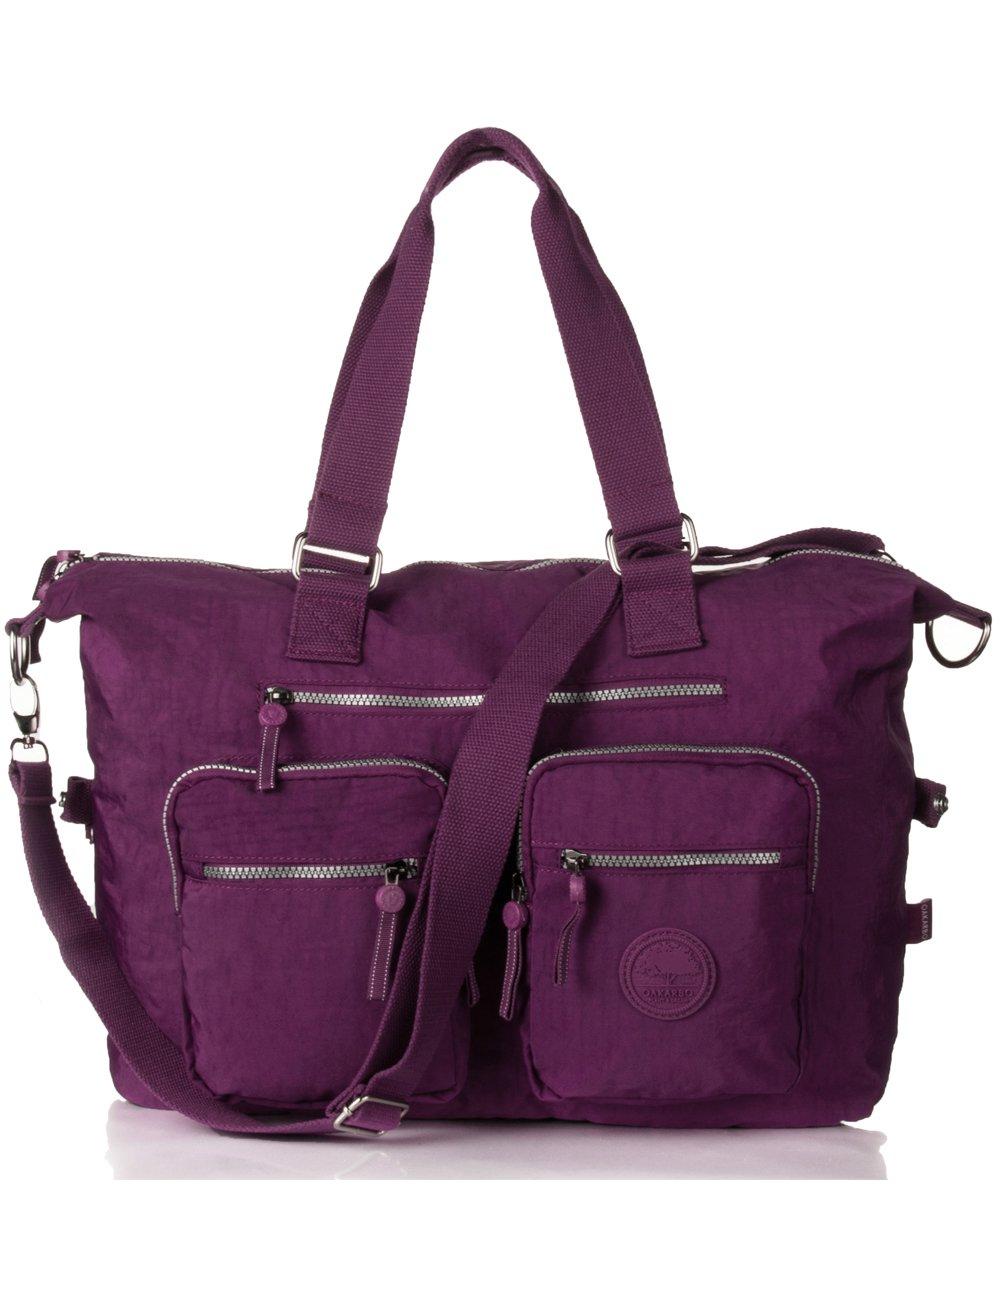 Detalles acerca de Weekender Bag Nylon oakarbo Grande Viaje Bolso 1212 Rojo  Violeta.- mostrar título original 91b913fc19729